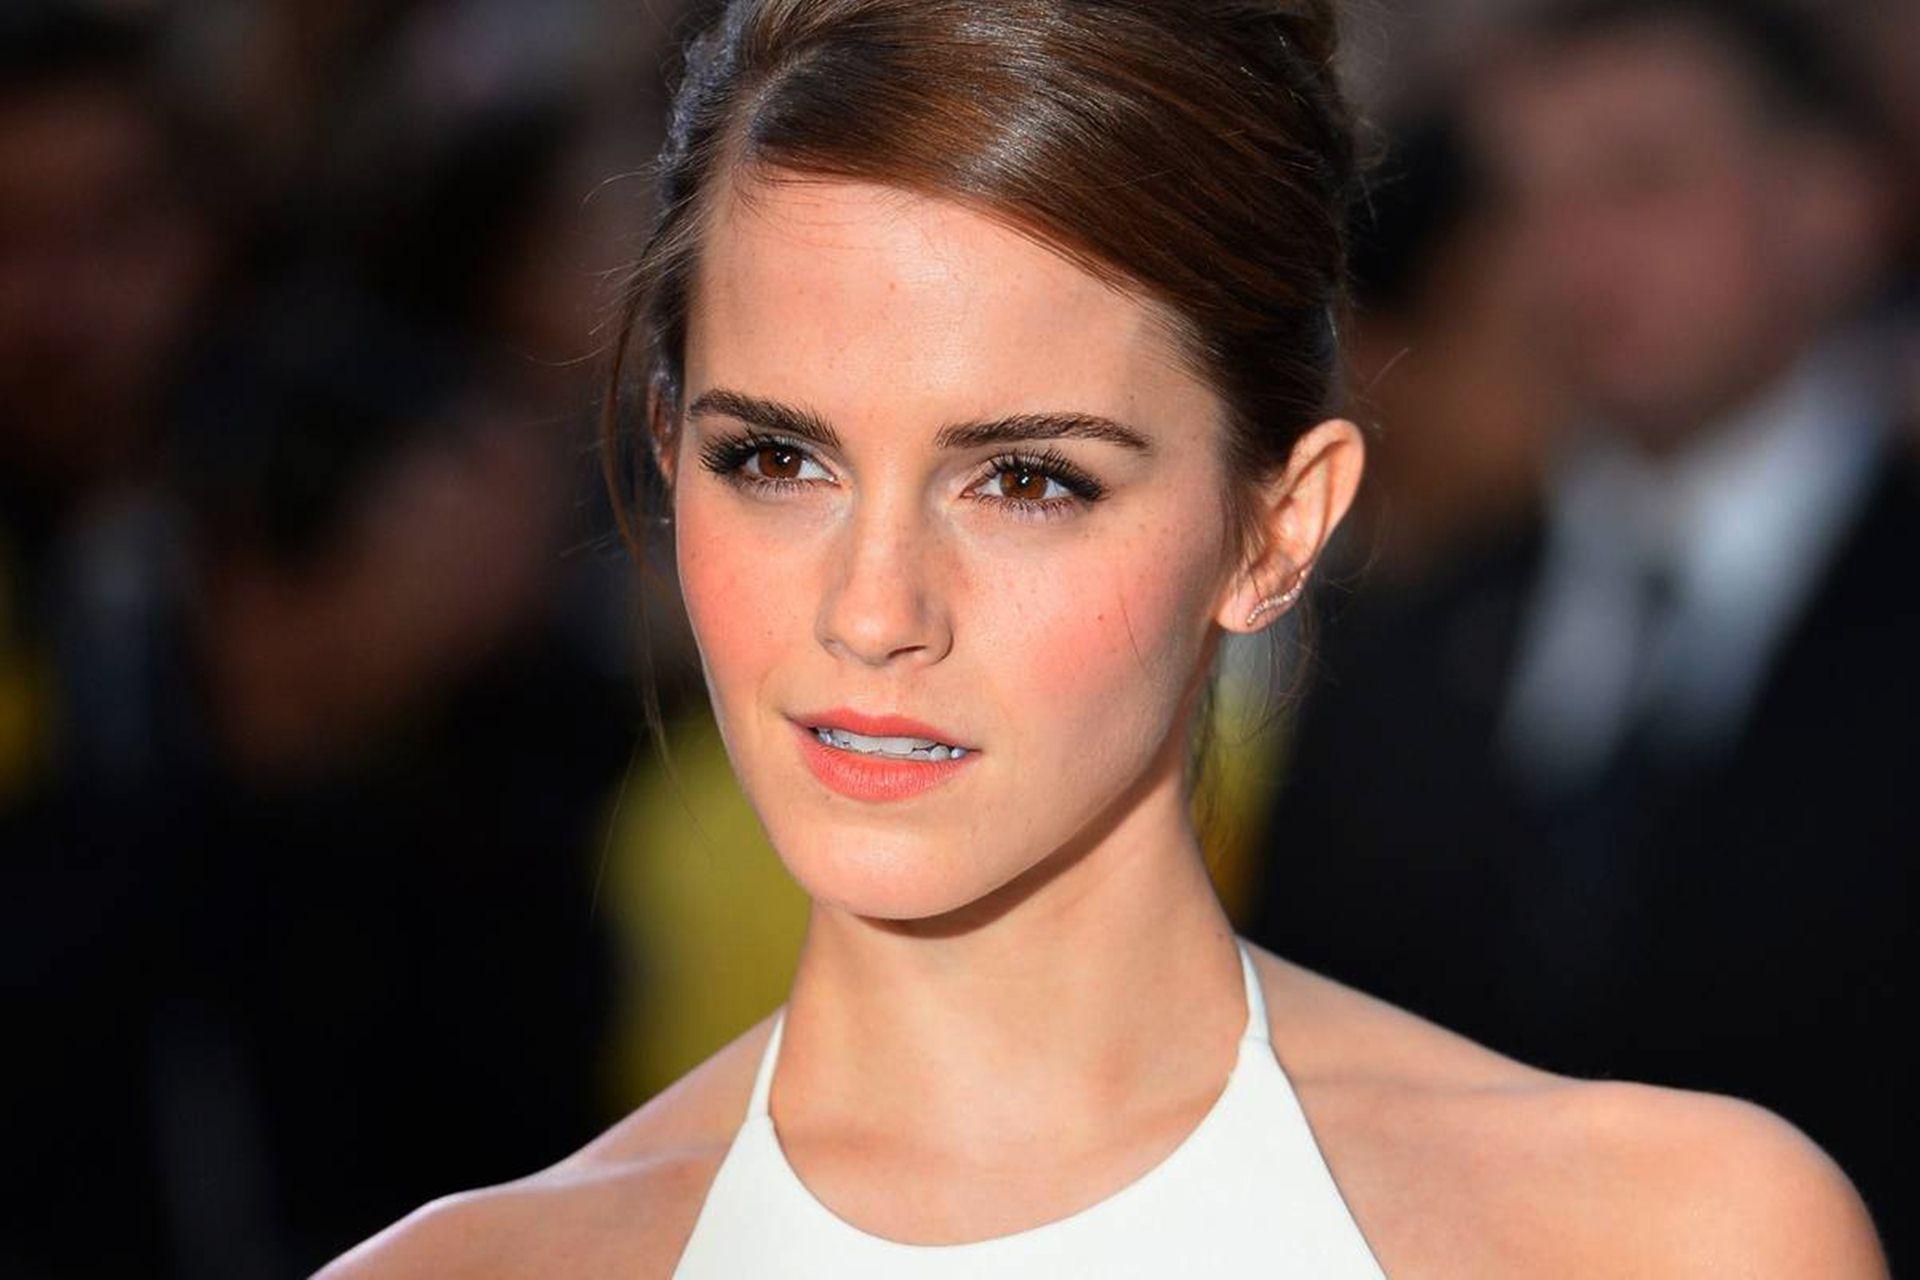 HQ Emma Watson Wallpapers | File 156.06Kb